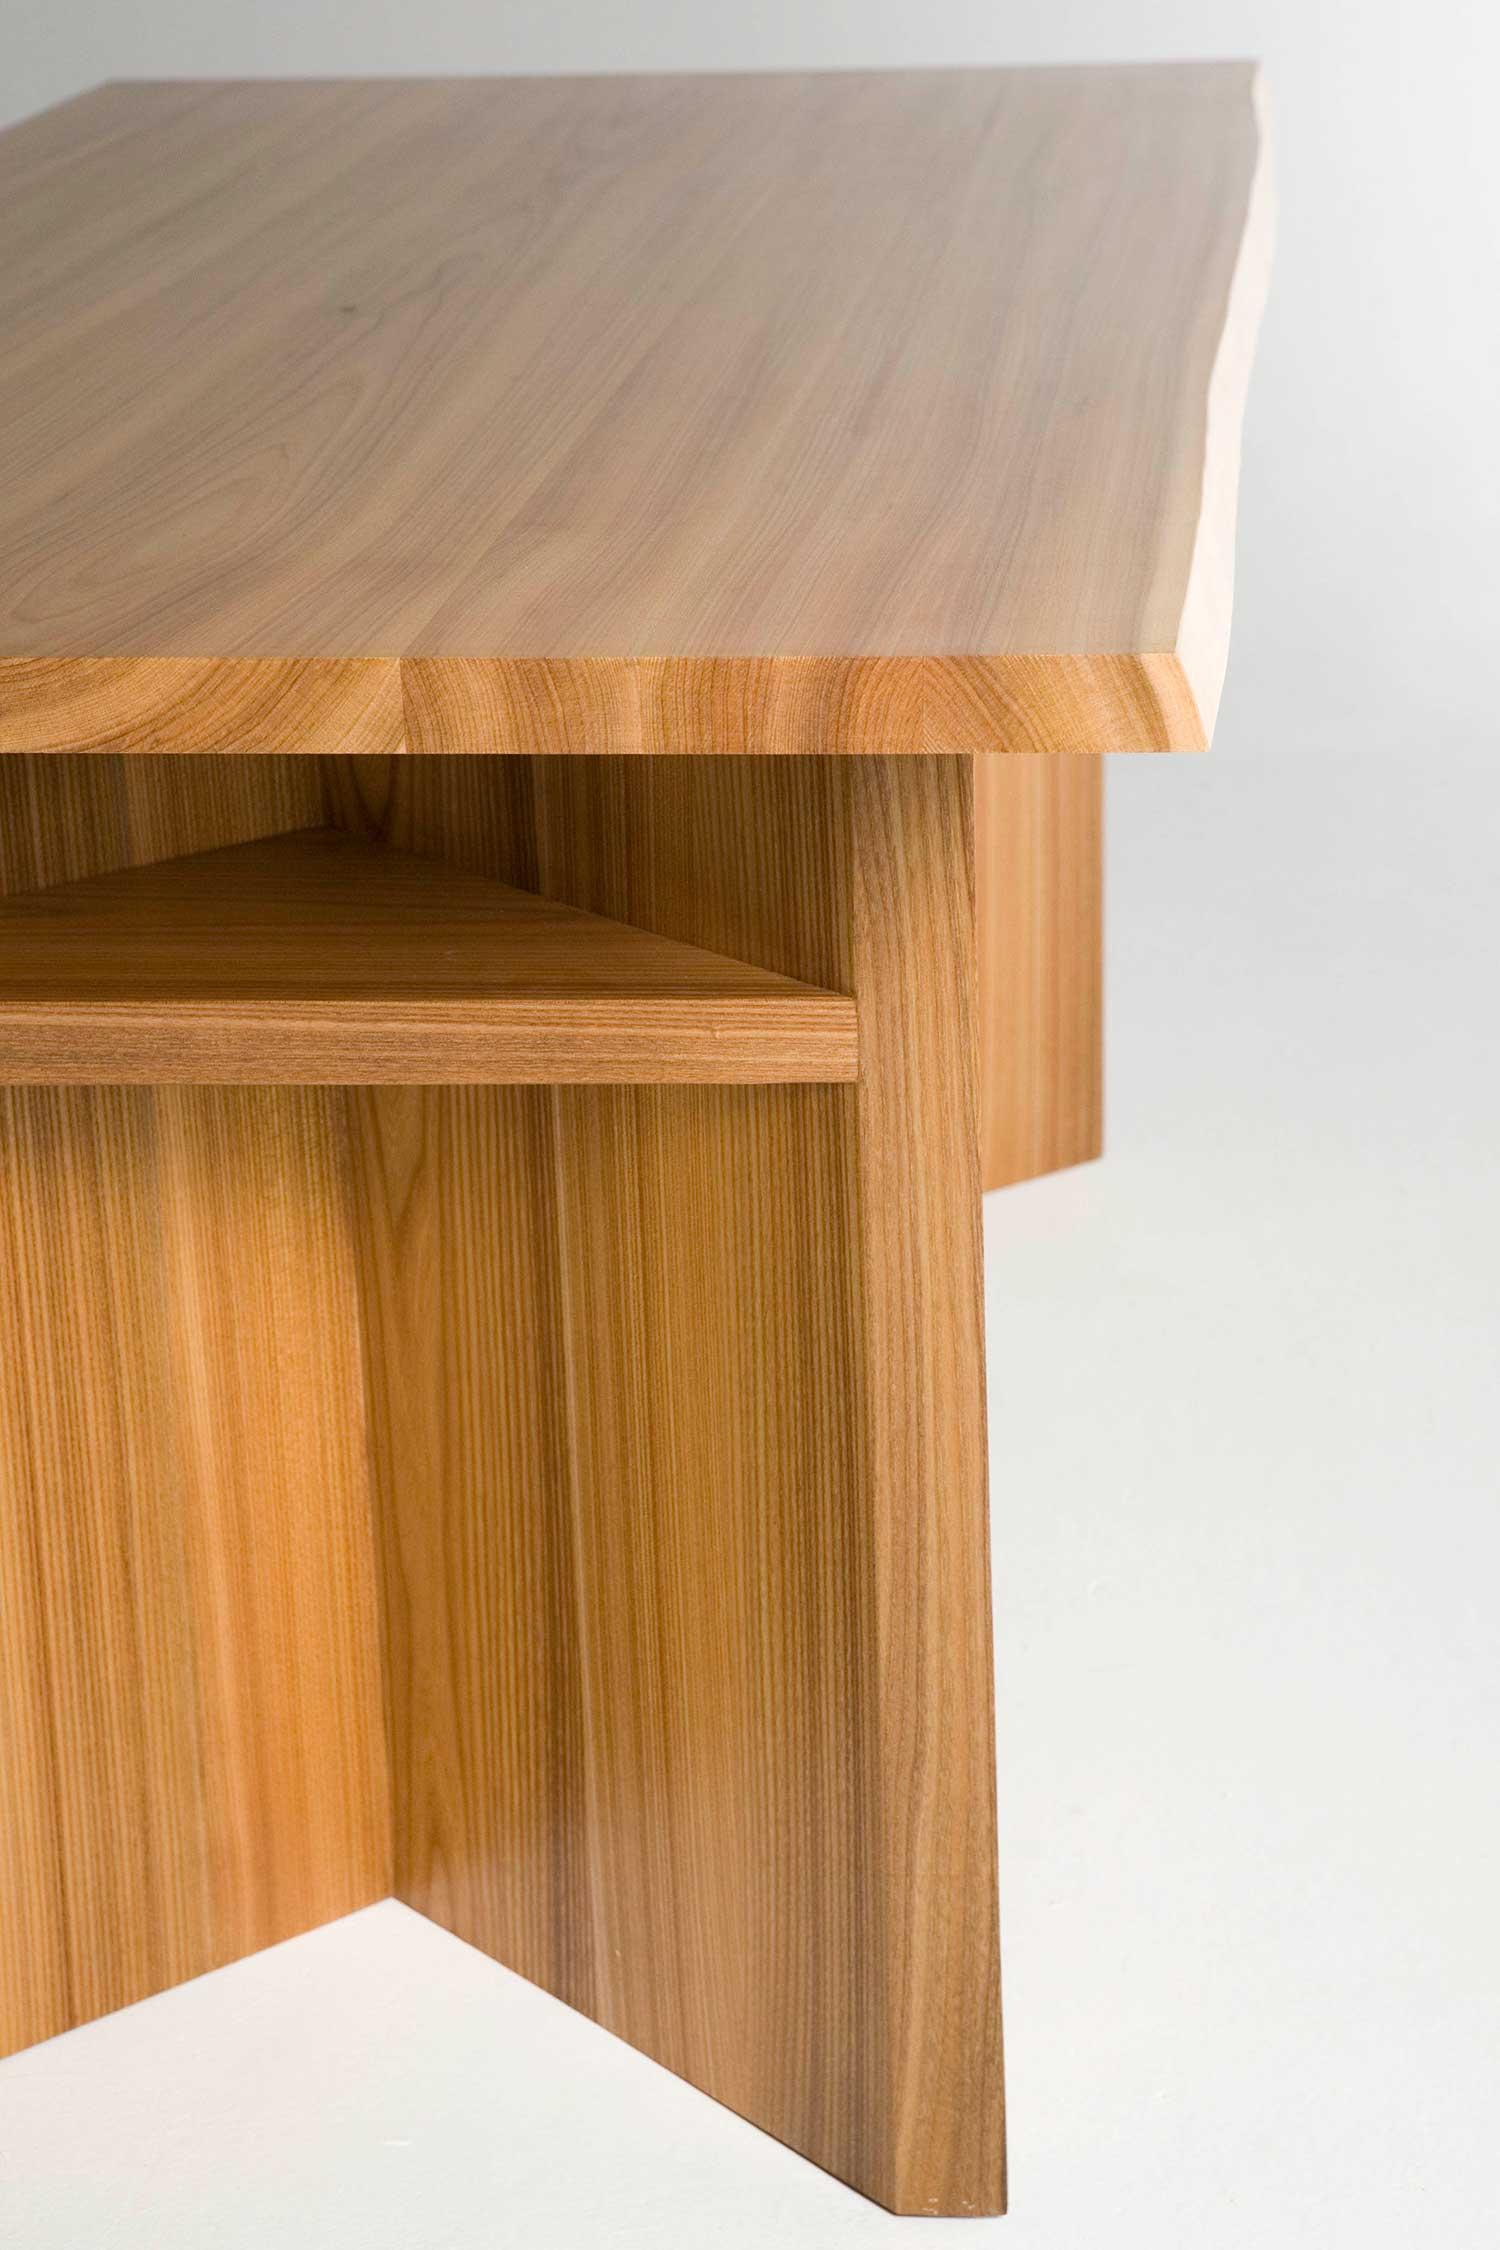 wickham-quartersawn-elm-table3.jpg